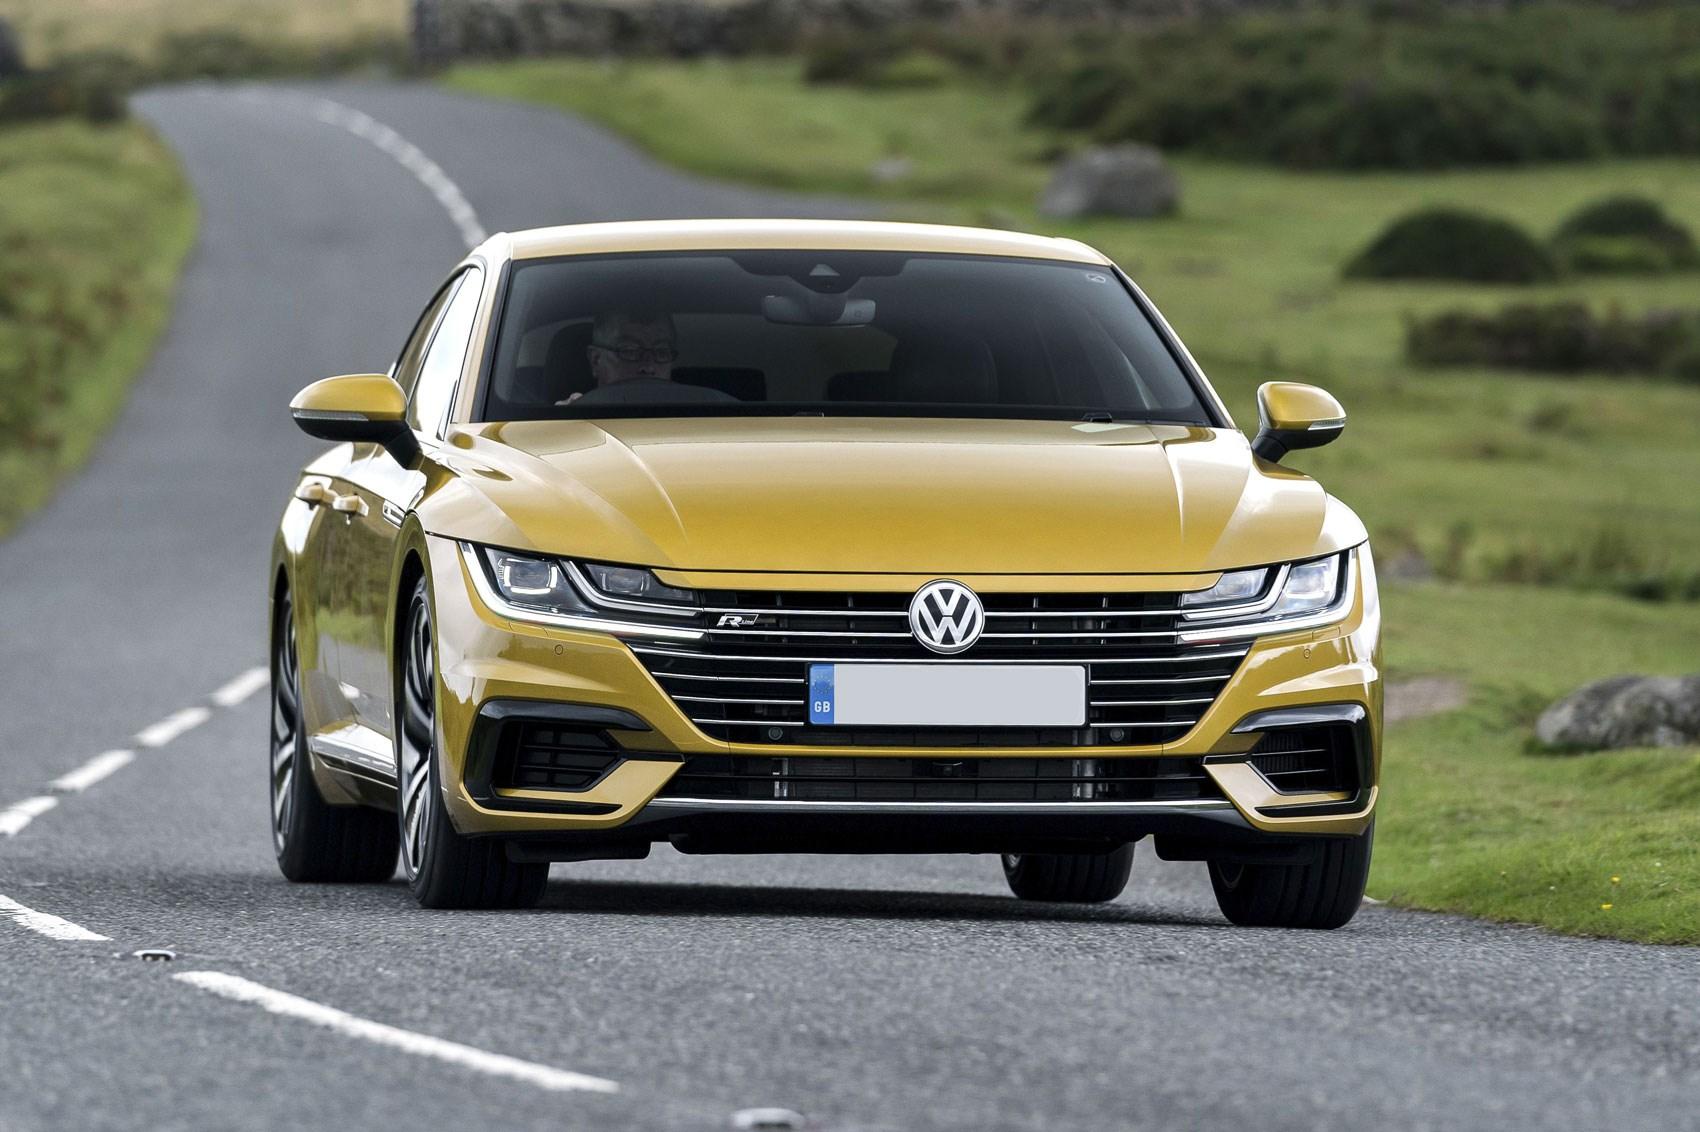 VW Arteon (2019) review: the mouldbreaker